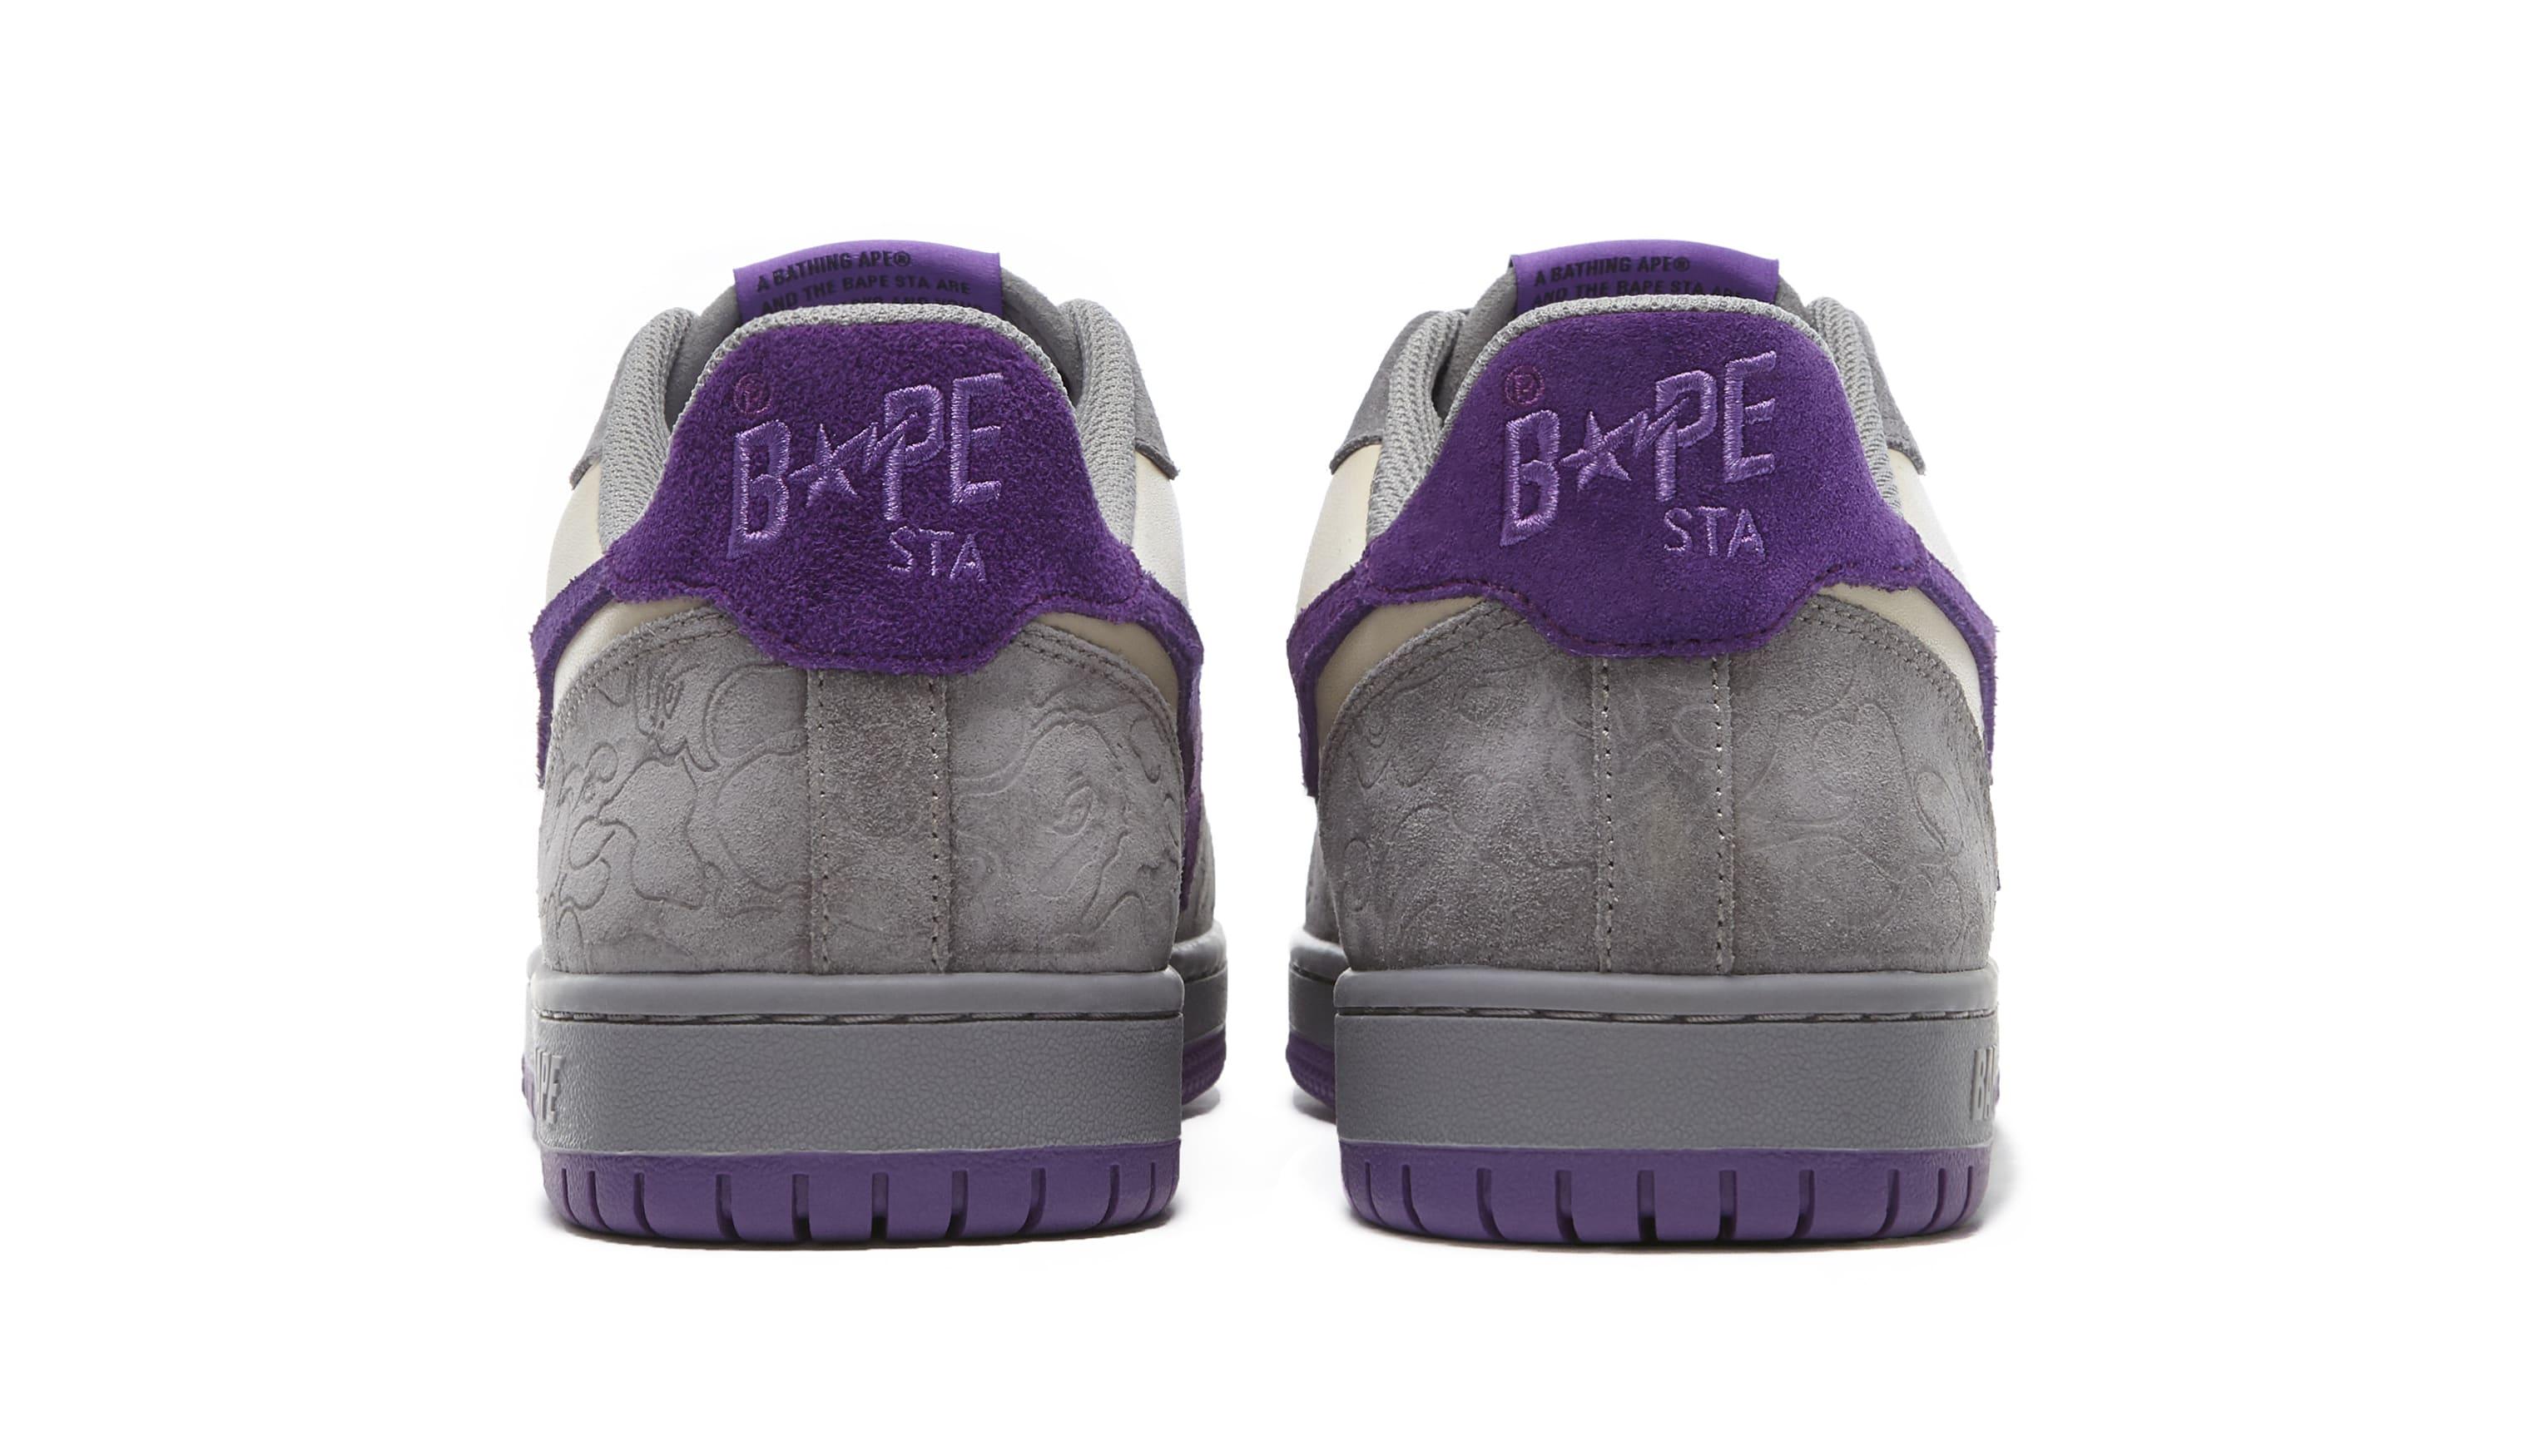 Bape Court Sta Mist Grey and Royal Purple Heel